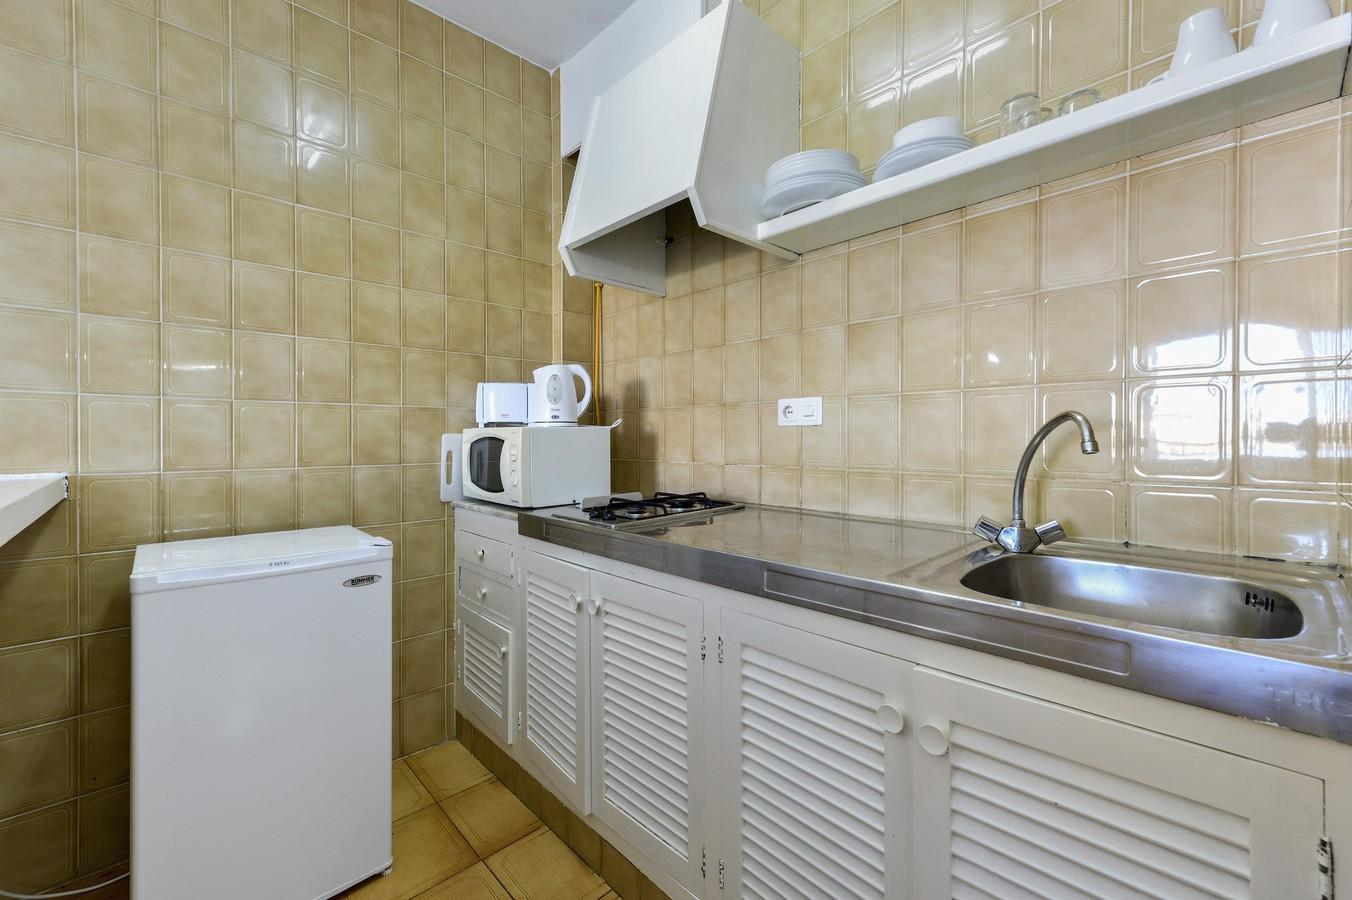 Ferienwohnung für 3 Personen ca 45 m² in Sant Josep de sa Talaia Ibiza Binnenland von Ibiza